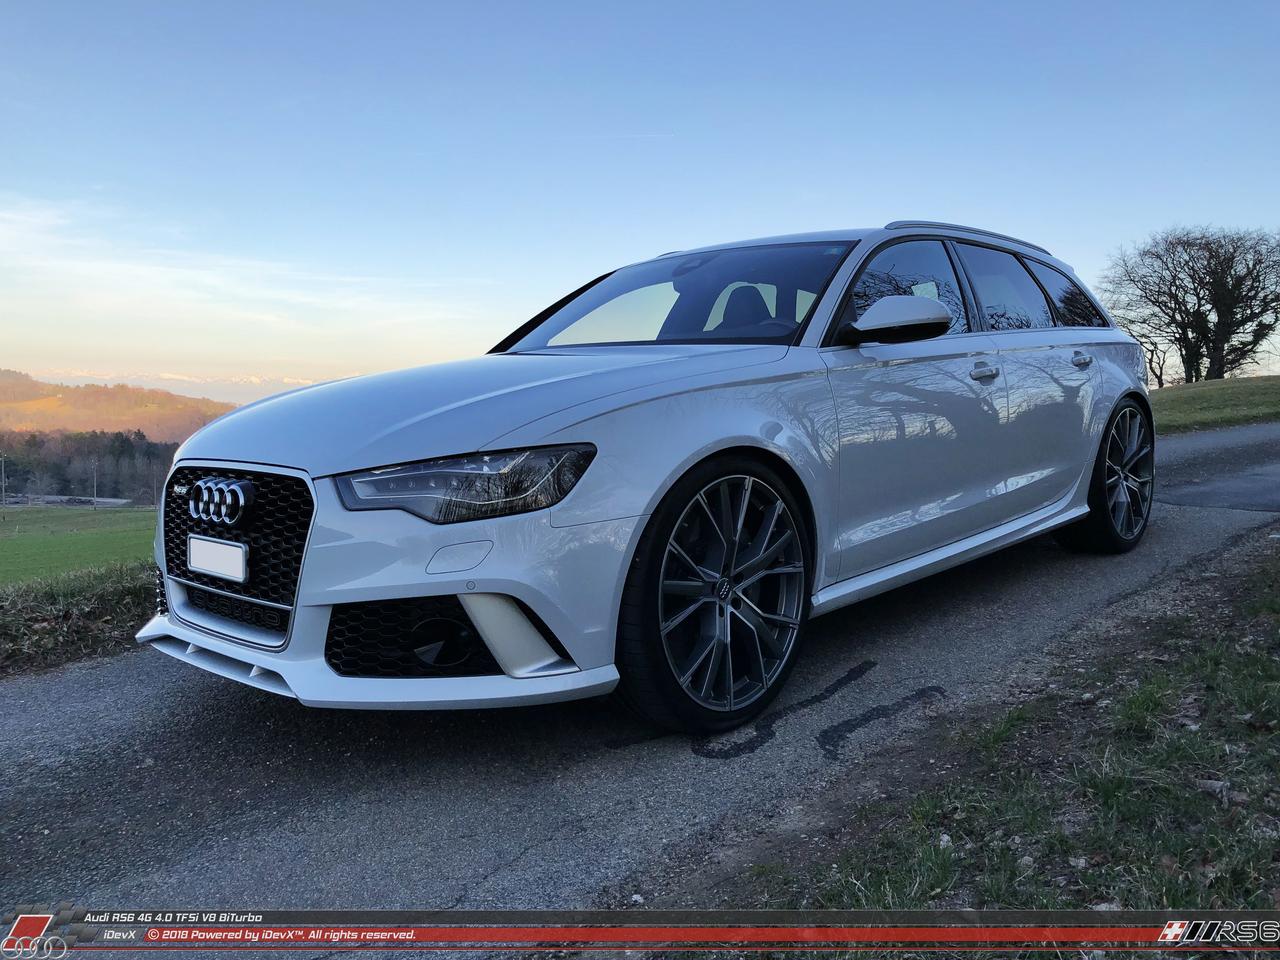 22_02.2019_Audi-RS6_iDevX_009.png